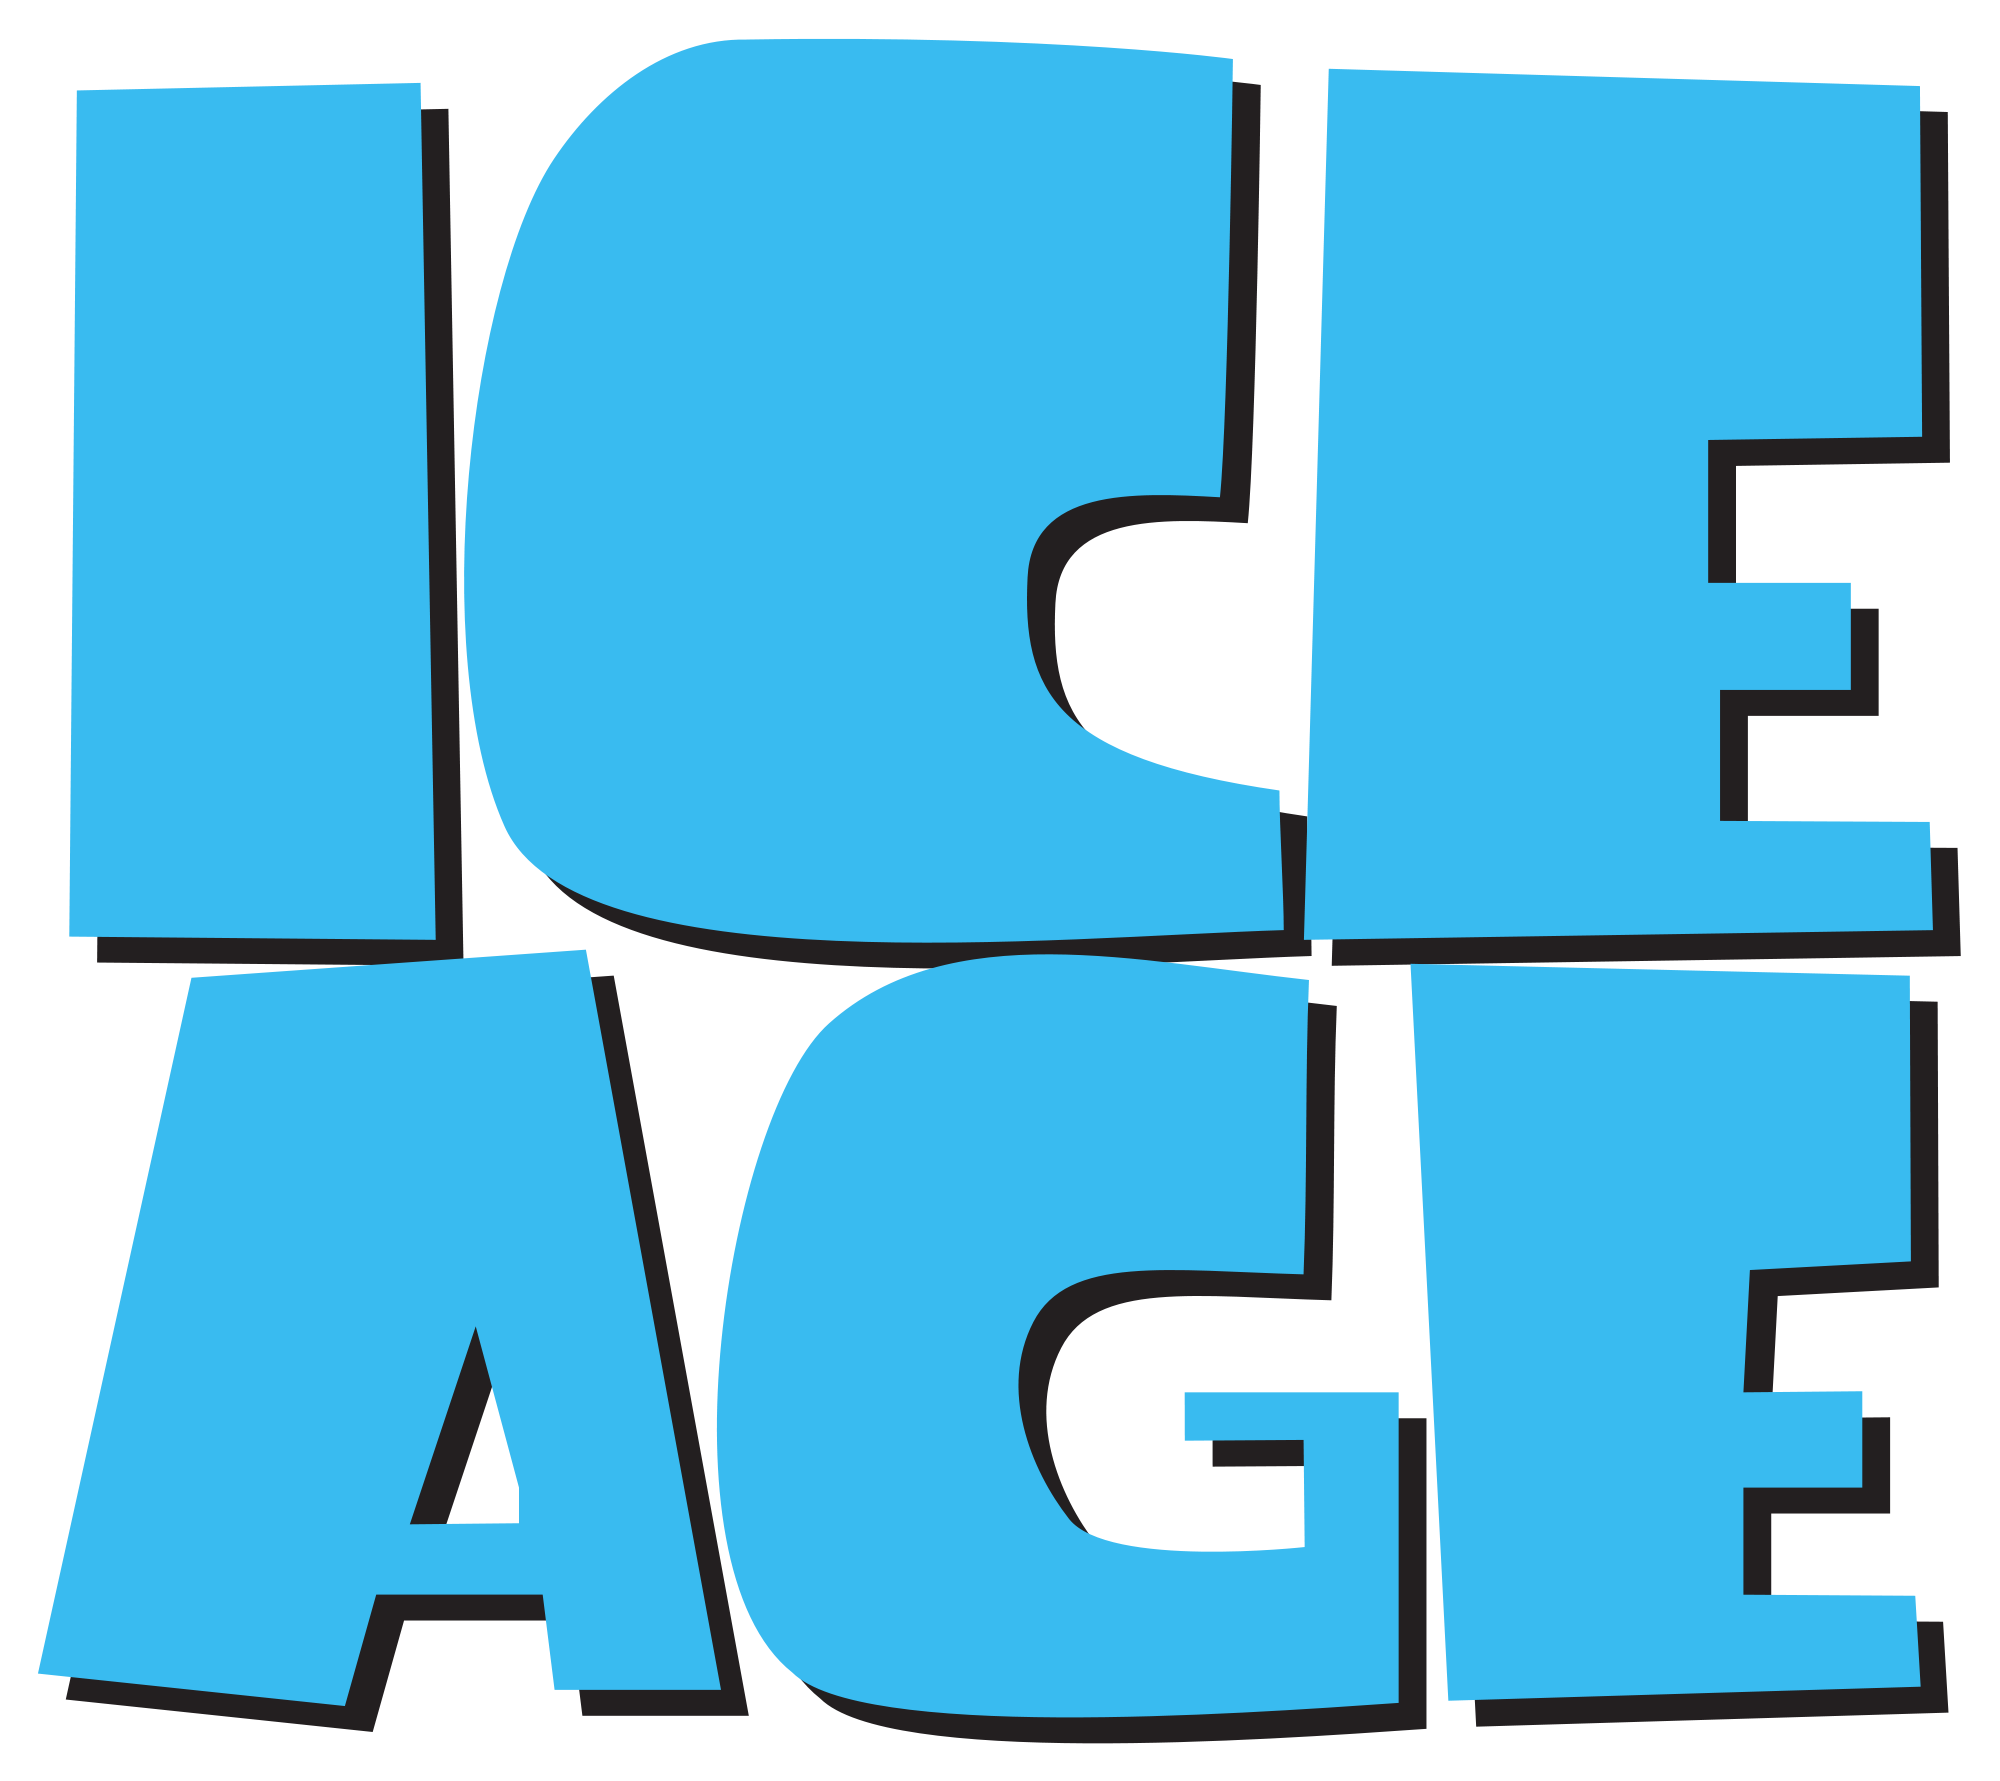 Ice la fox and havana ginger fucked by black man 4